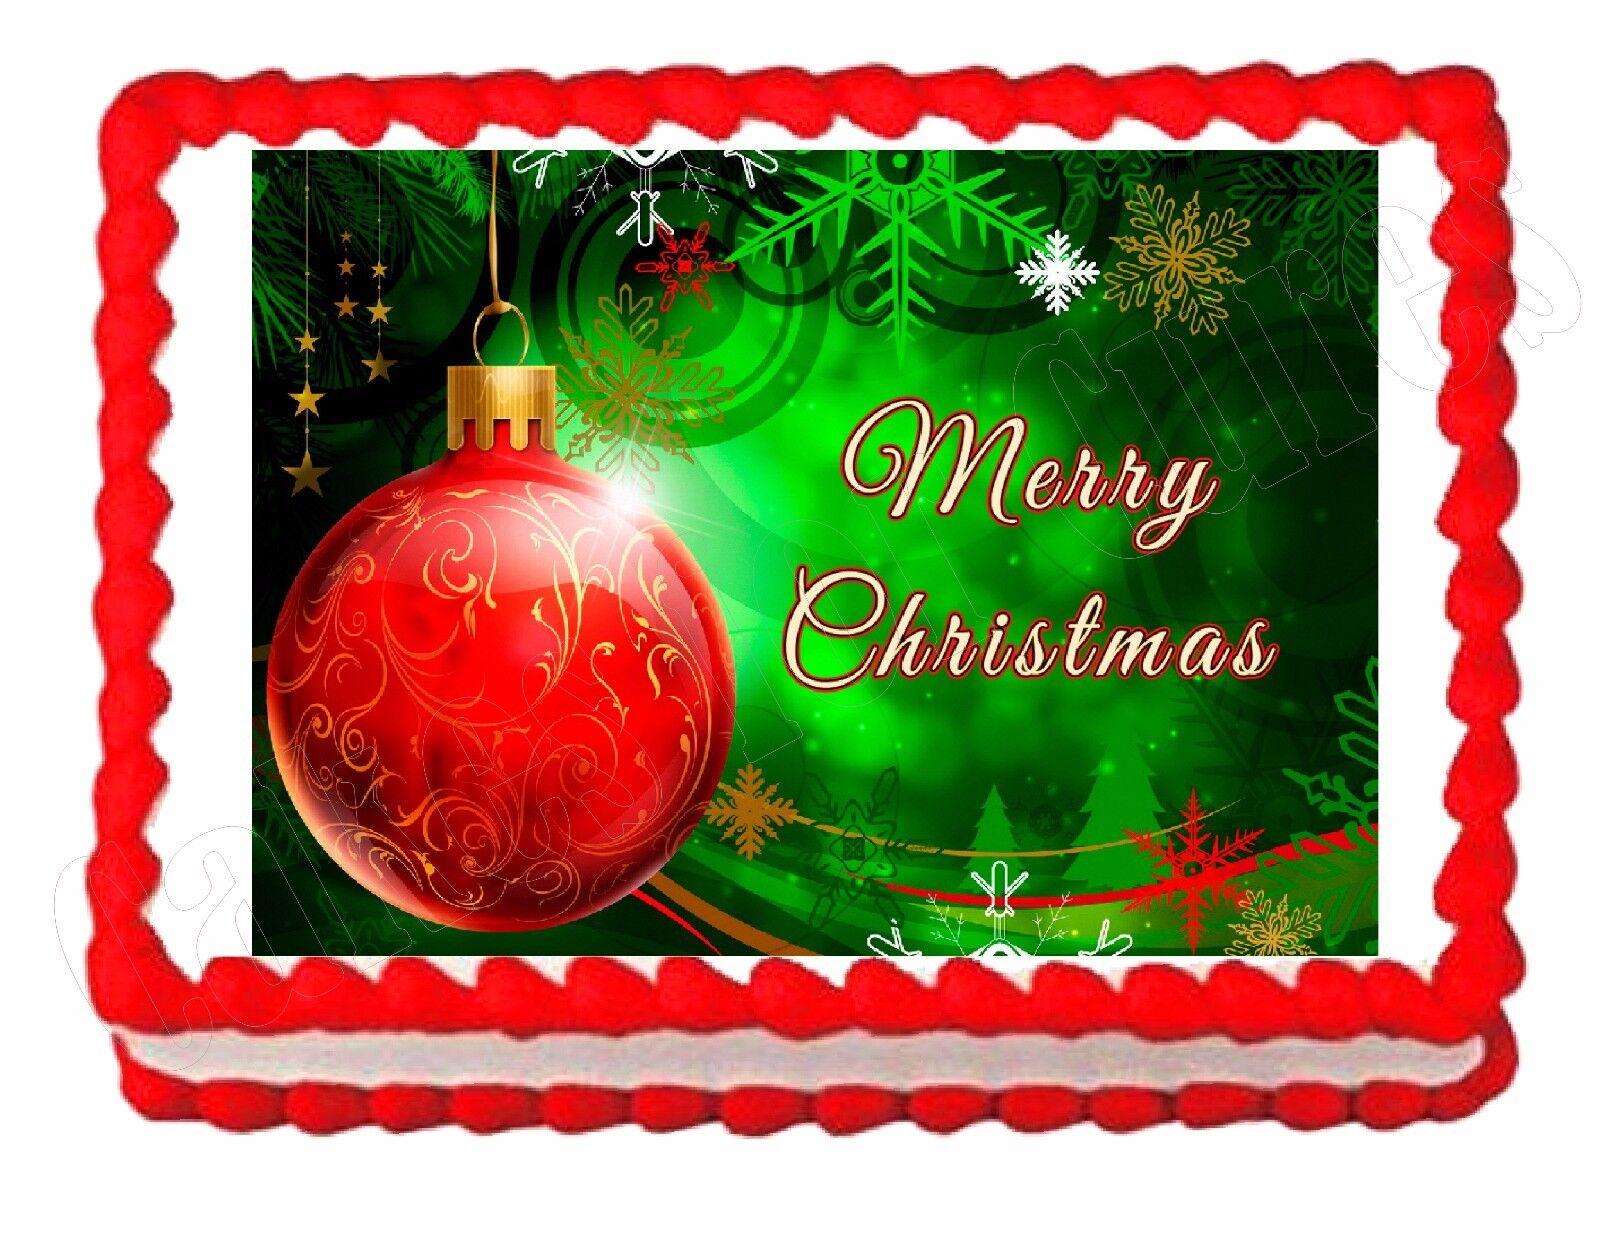 Christmas Holiday edible image cake topper decoration ...